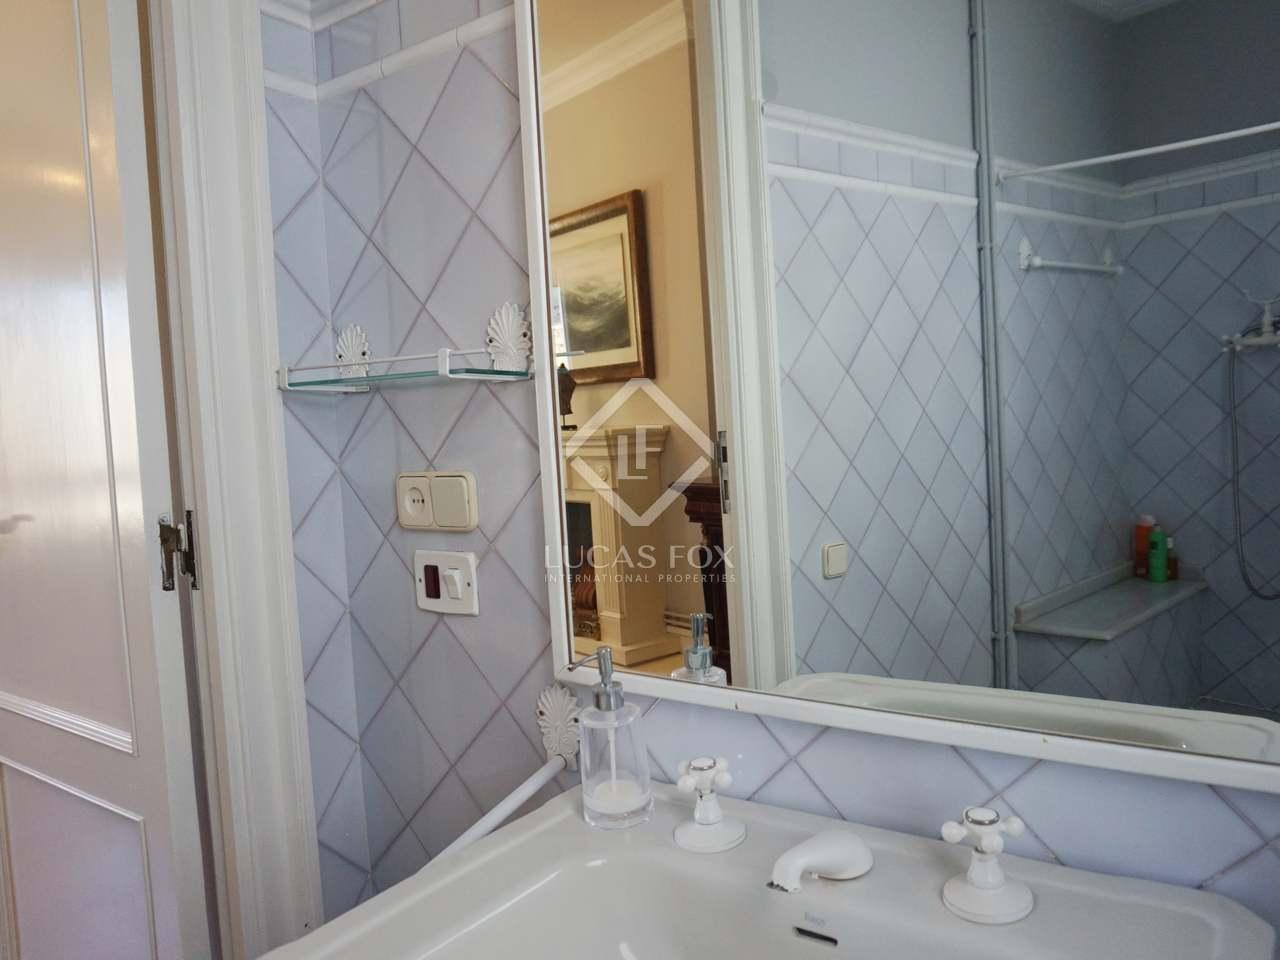 342m wohnung zum verkauf in sant francesc valencia. Black Bedroom Furniture Sets. Home Design Ideas